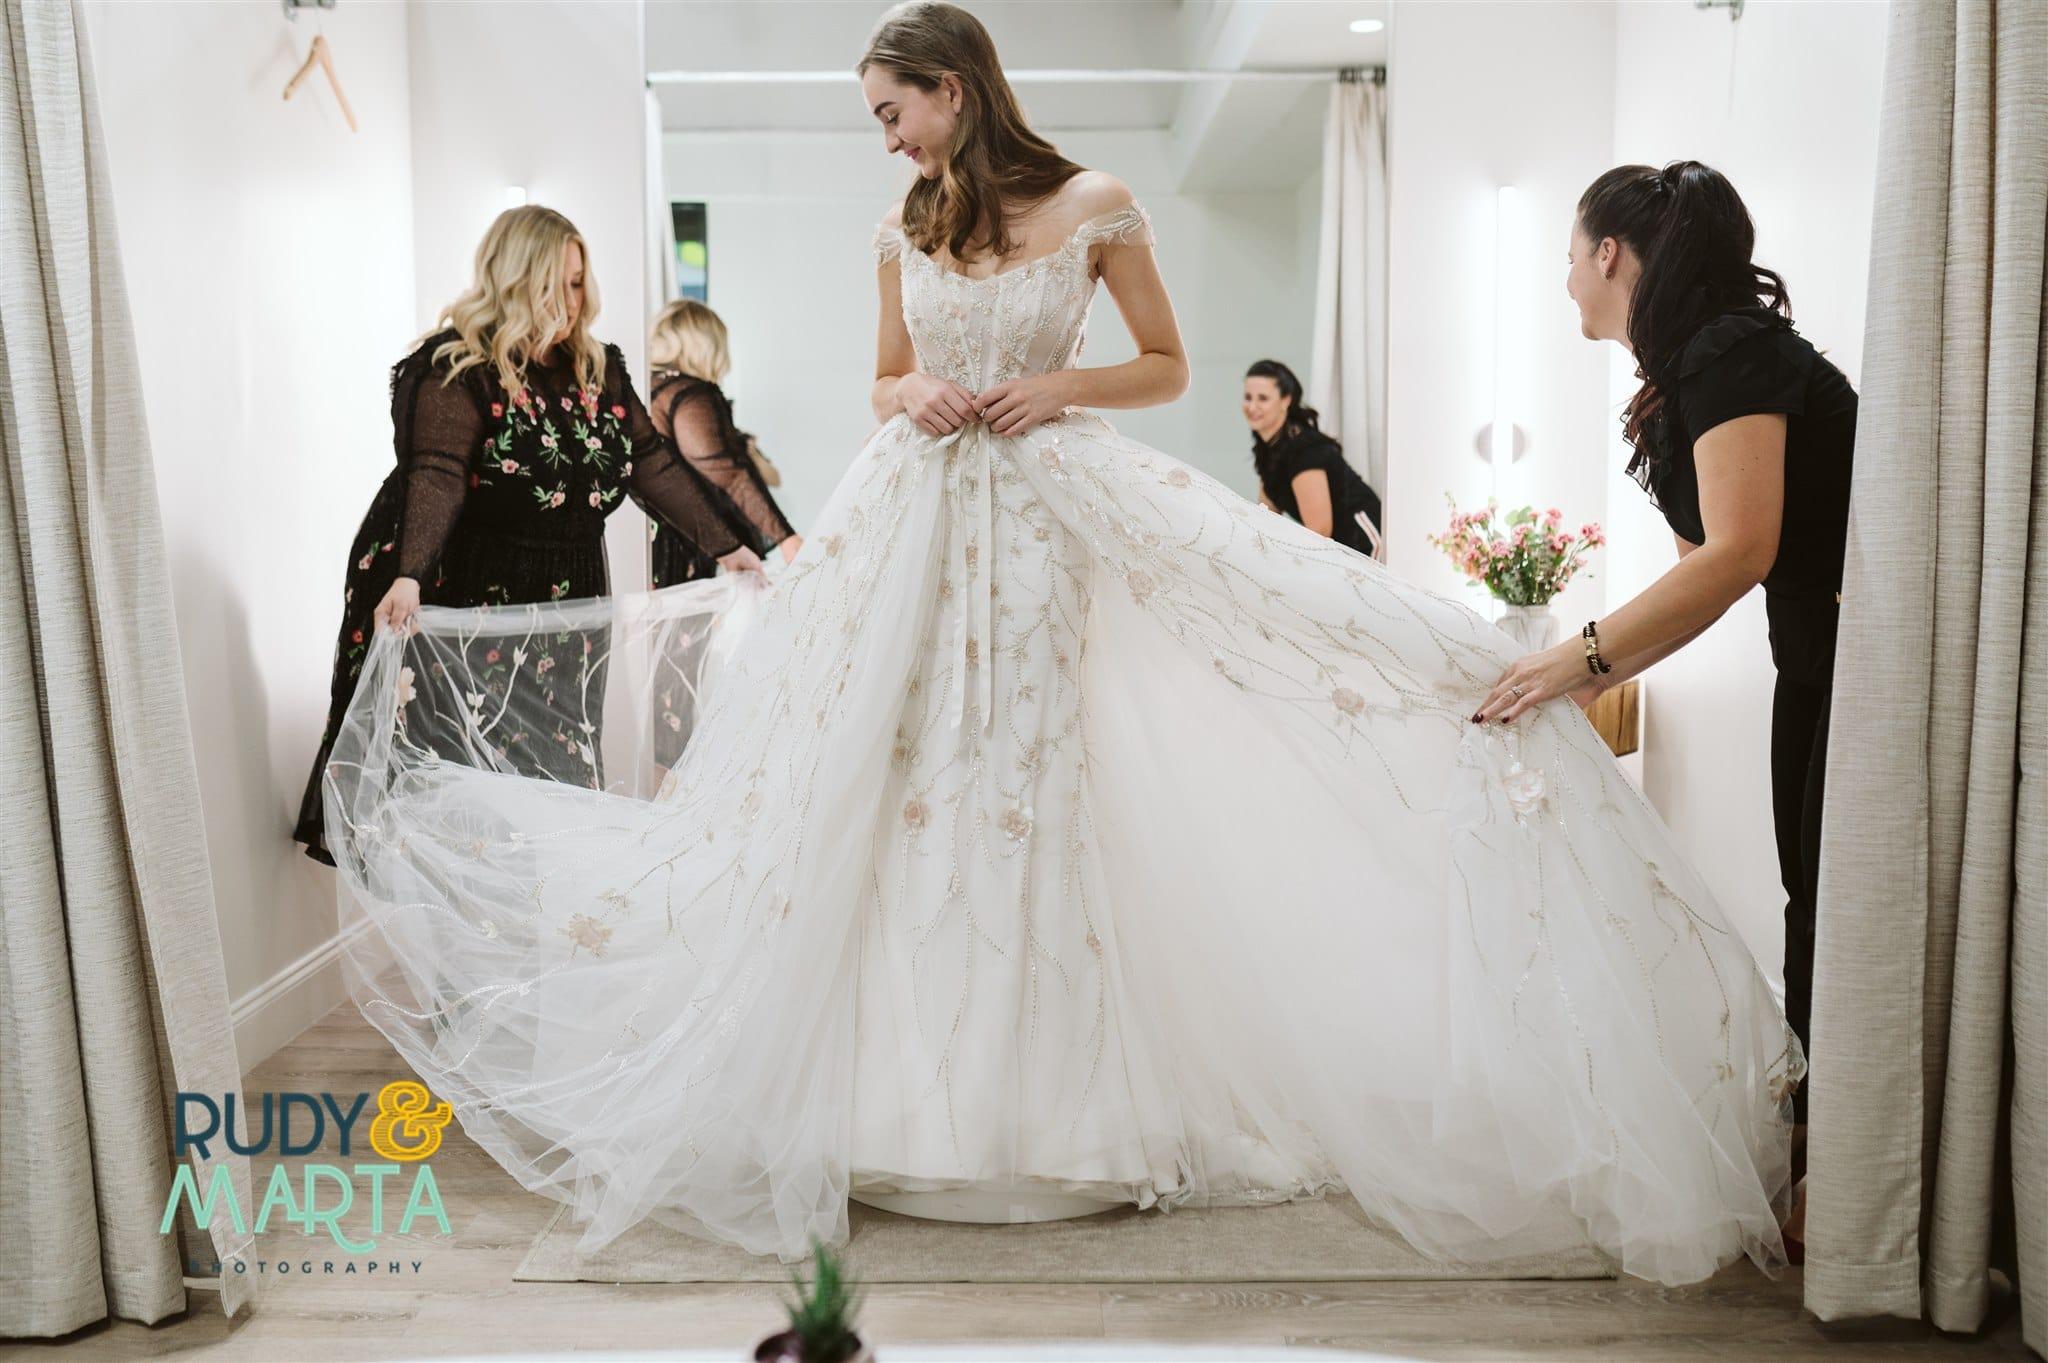 the-bridal-finery94d6d73b247f0eb2ebe92efa6977d5fc